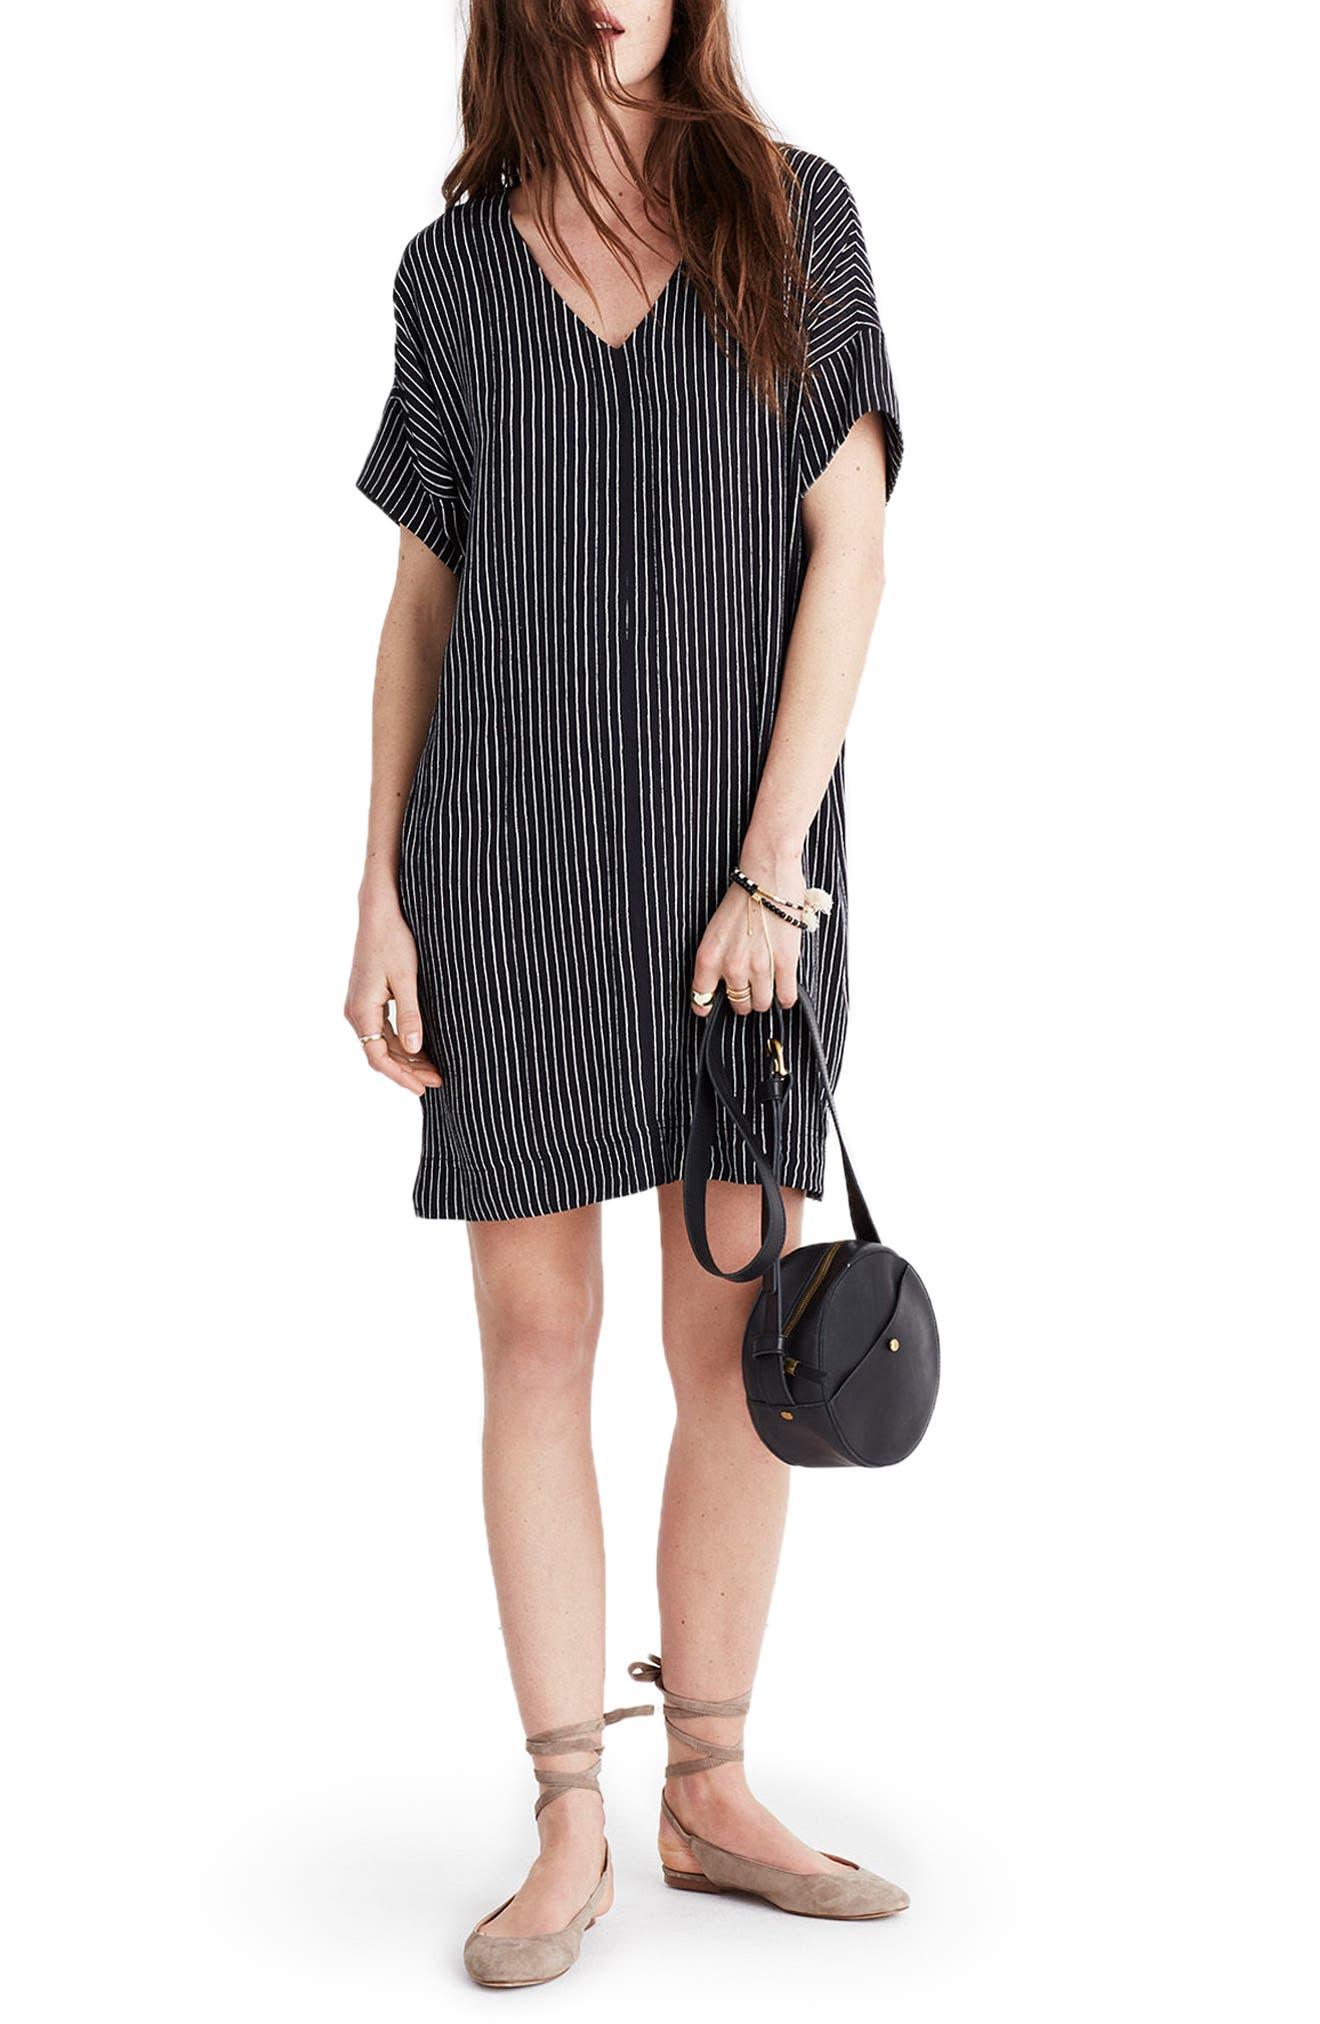 Main Image - Madewell Novel Chalkboard Stripe Dress